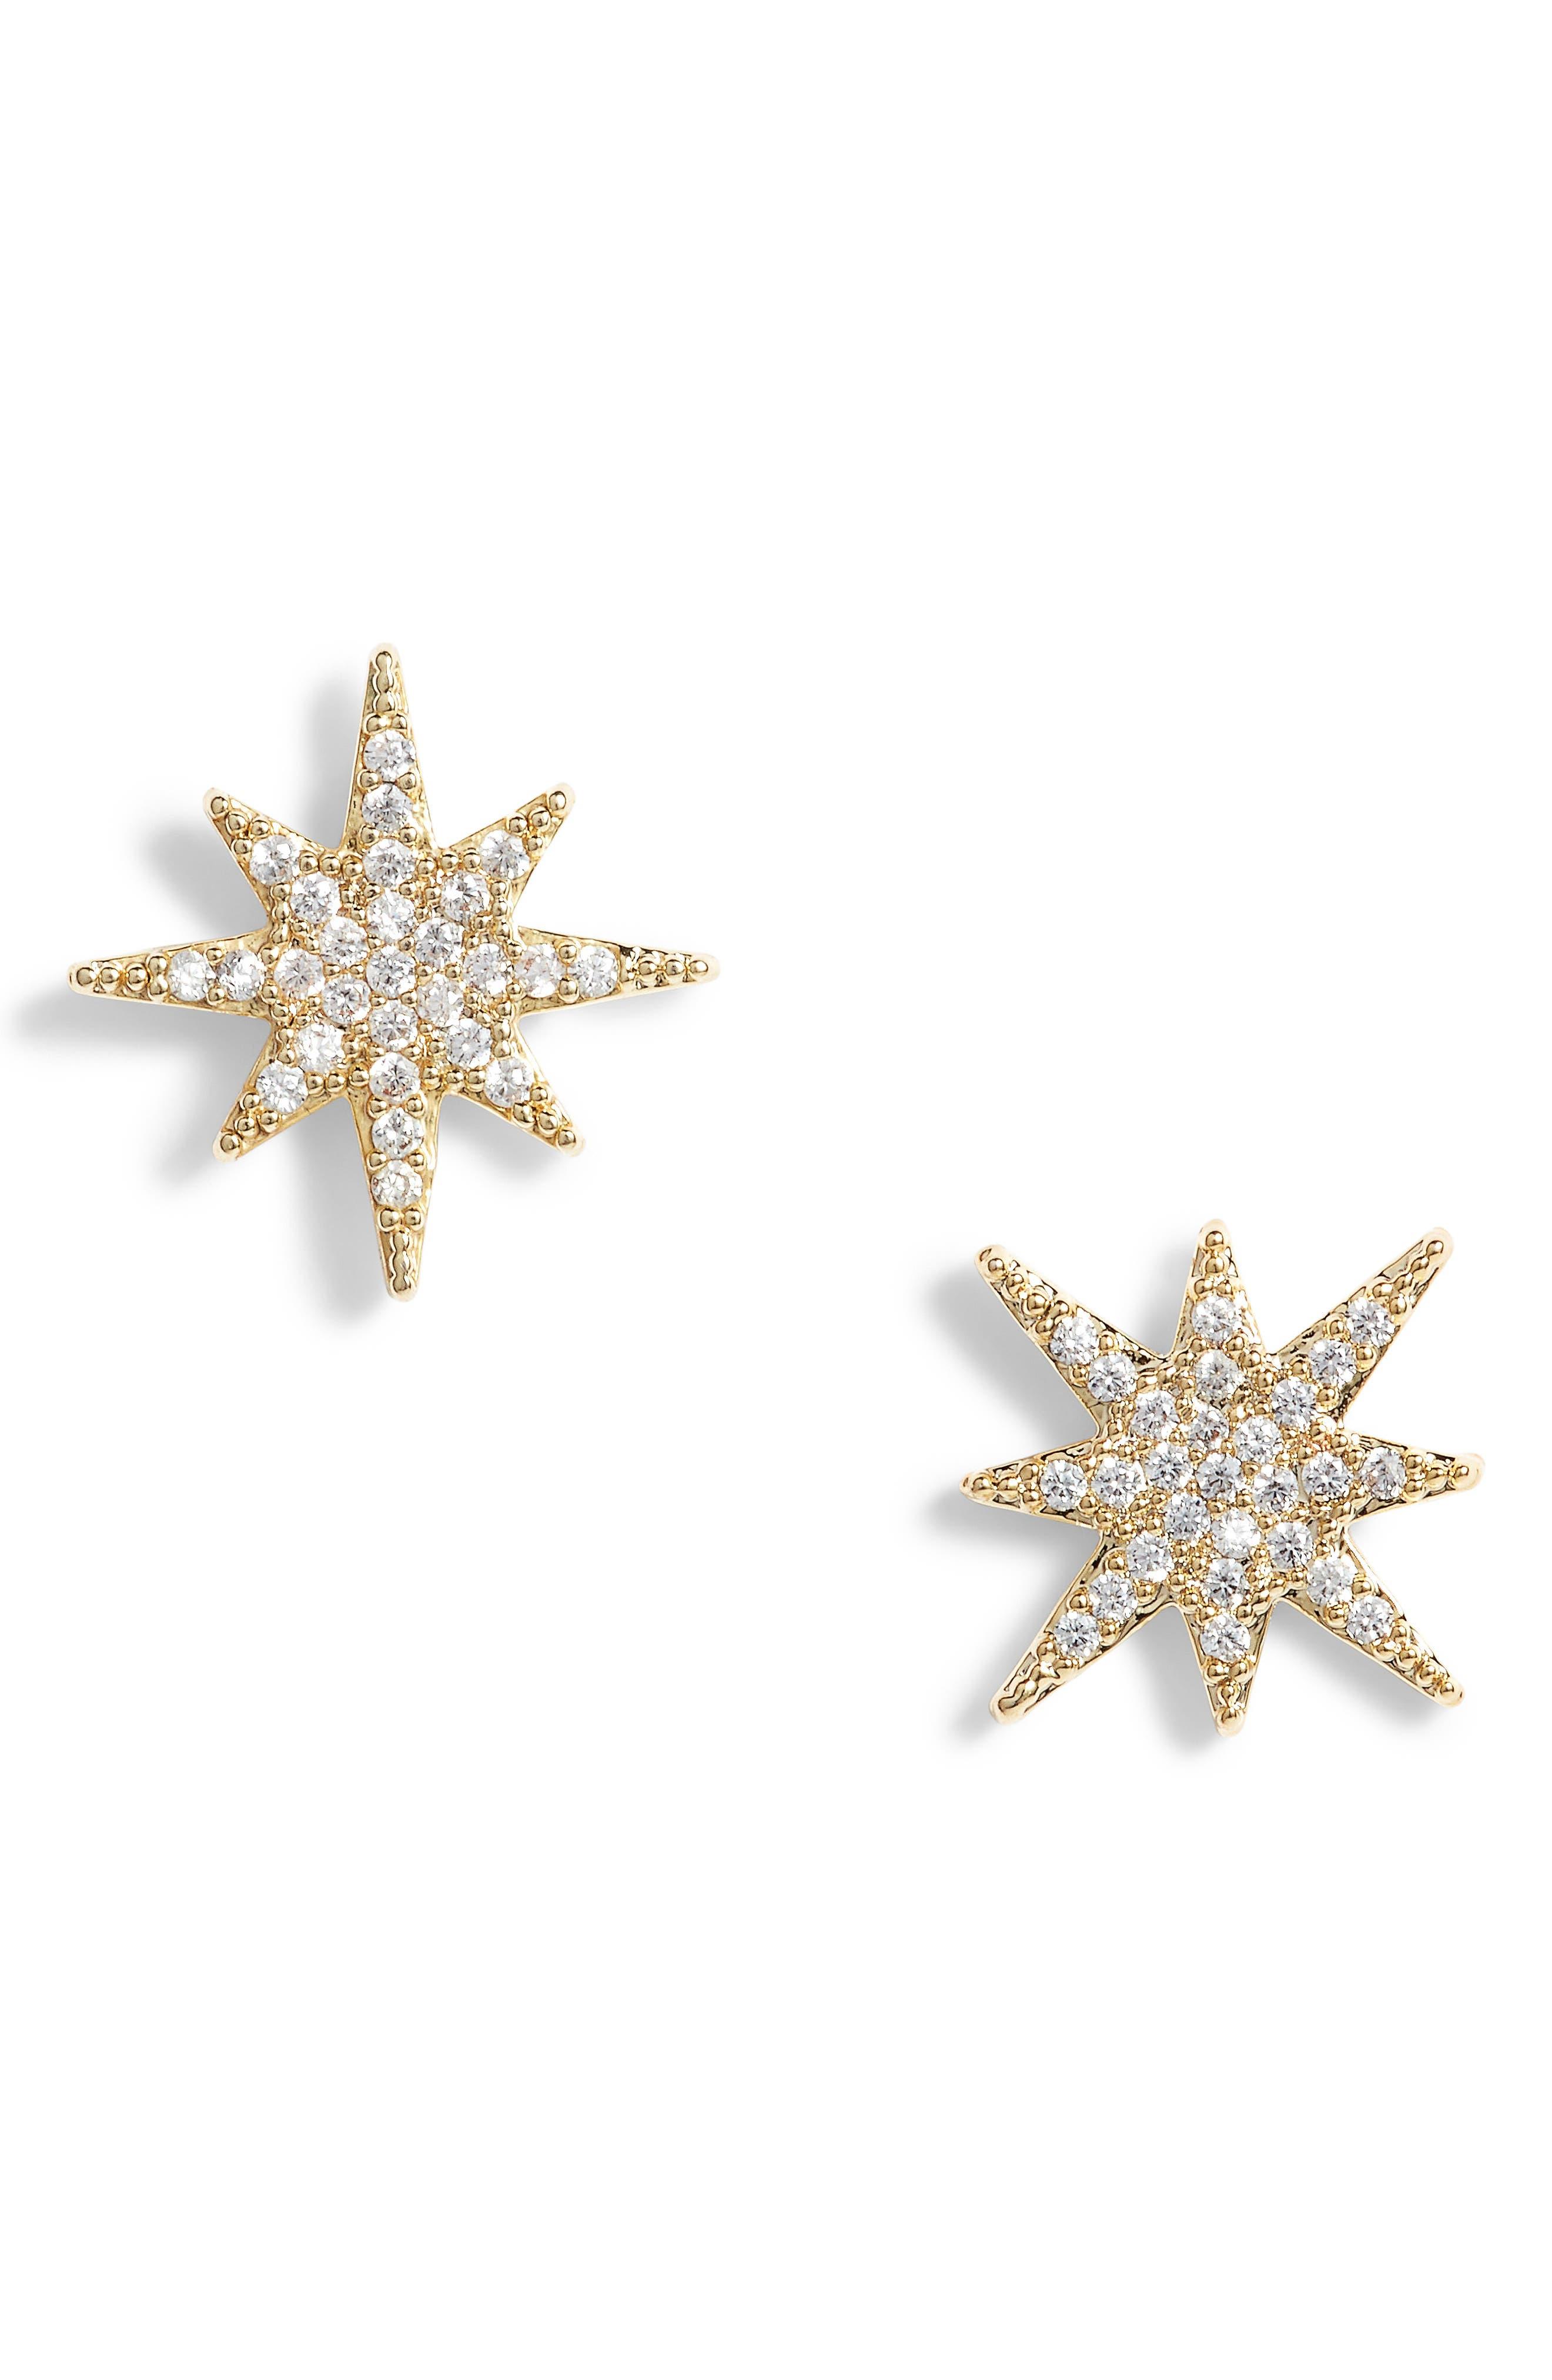 Alternate Image 1 Selected - Serefina Small Starburst Crystal Earrings